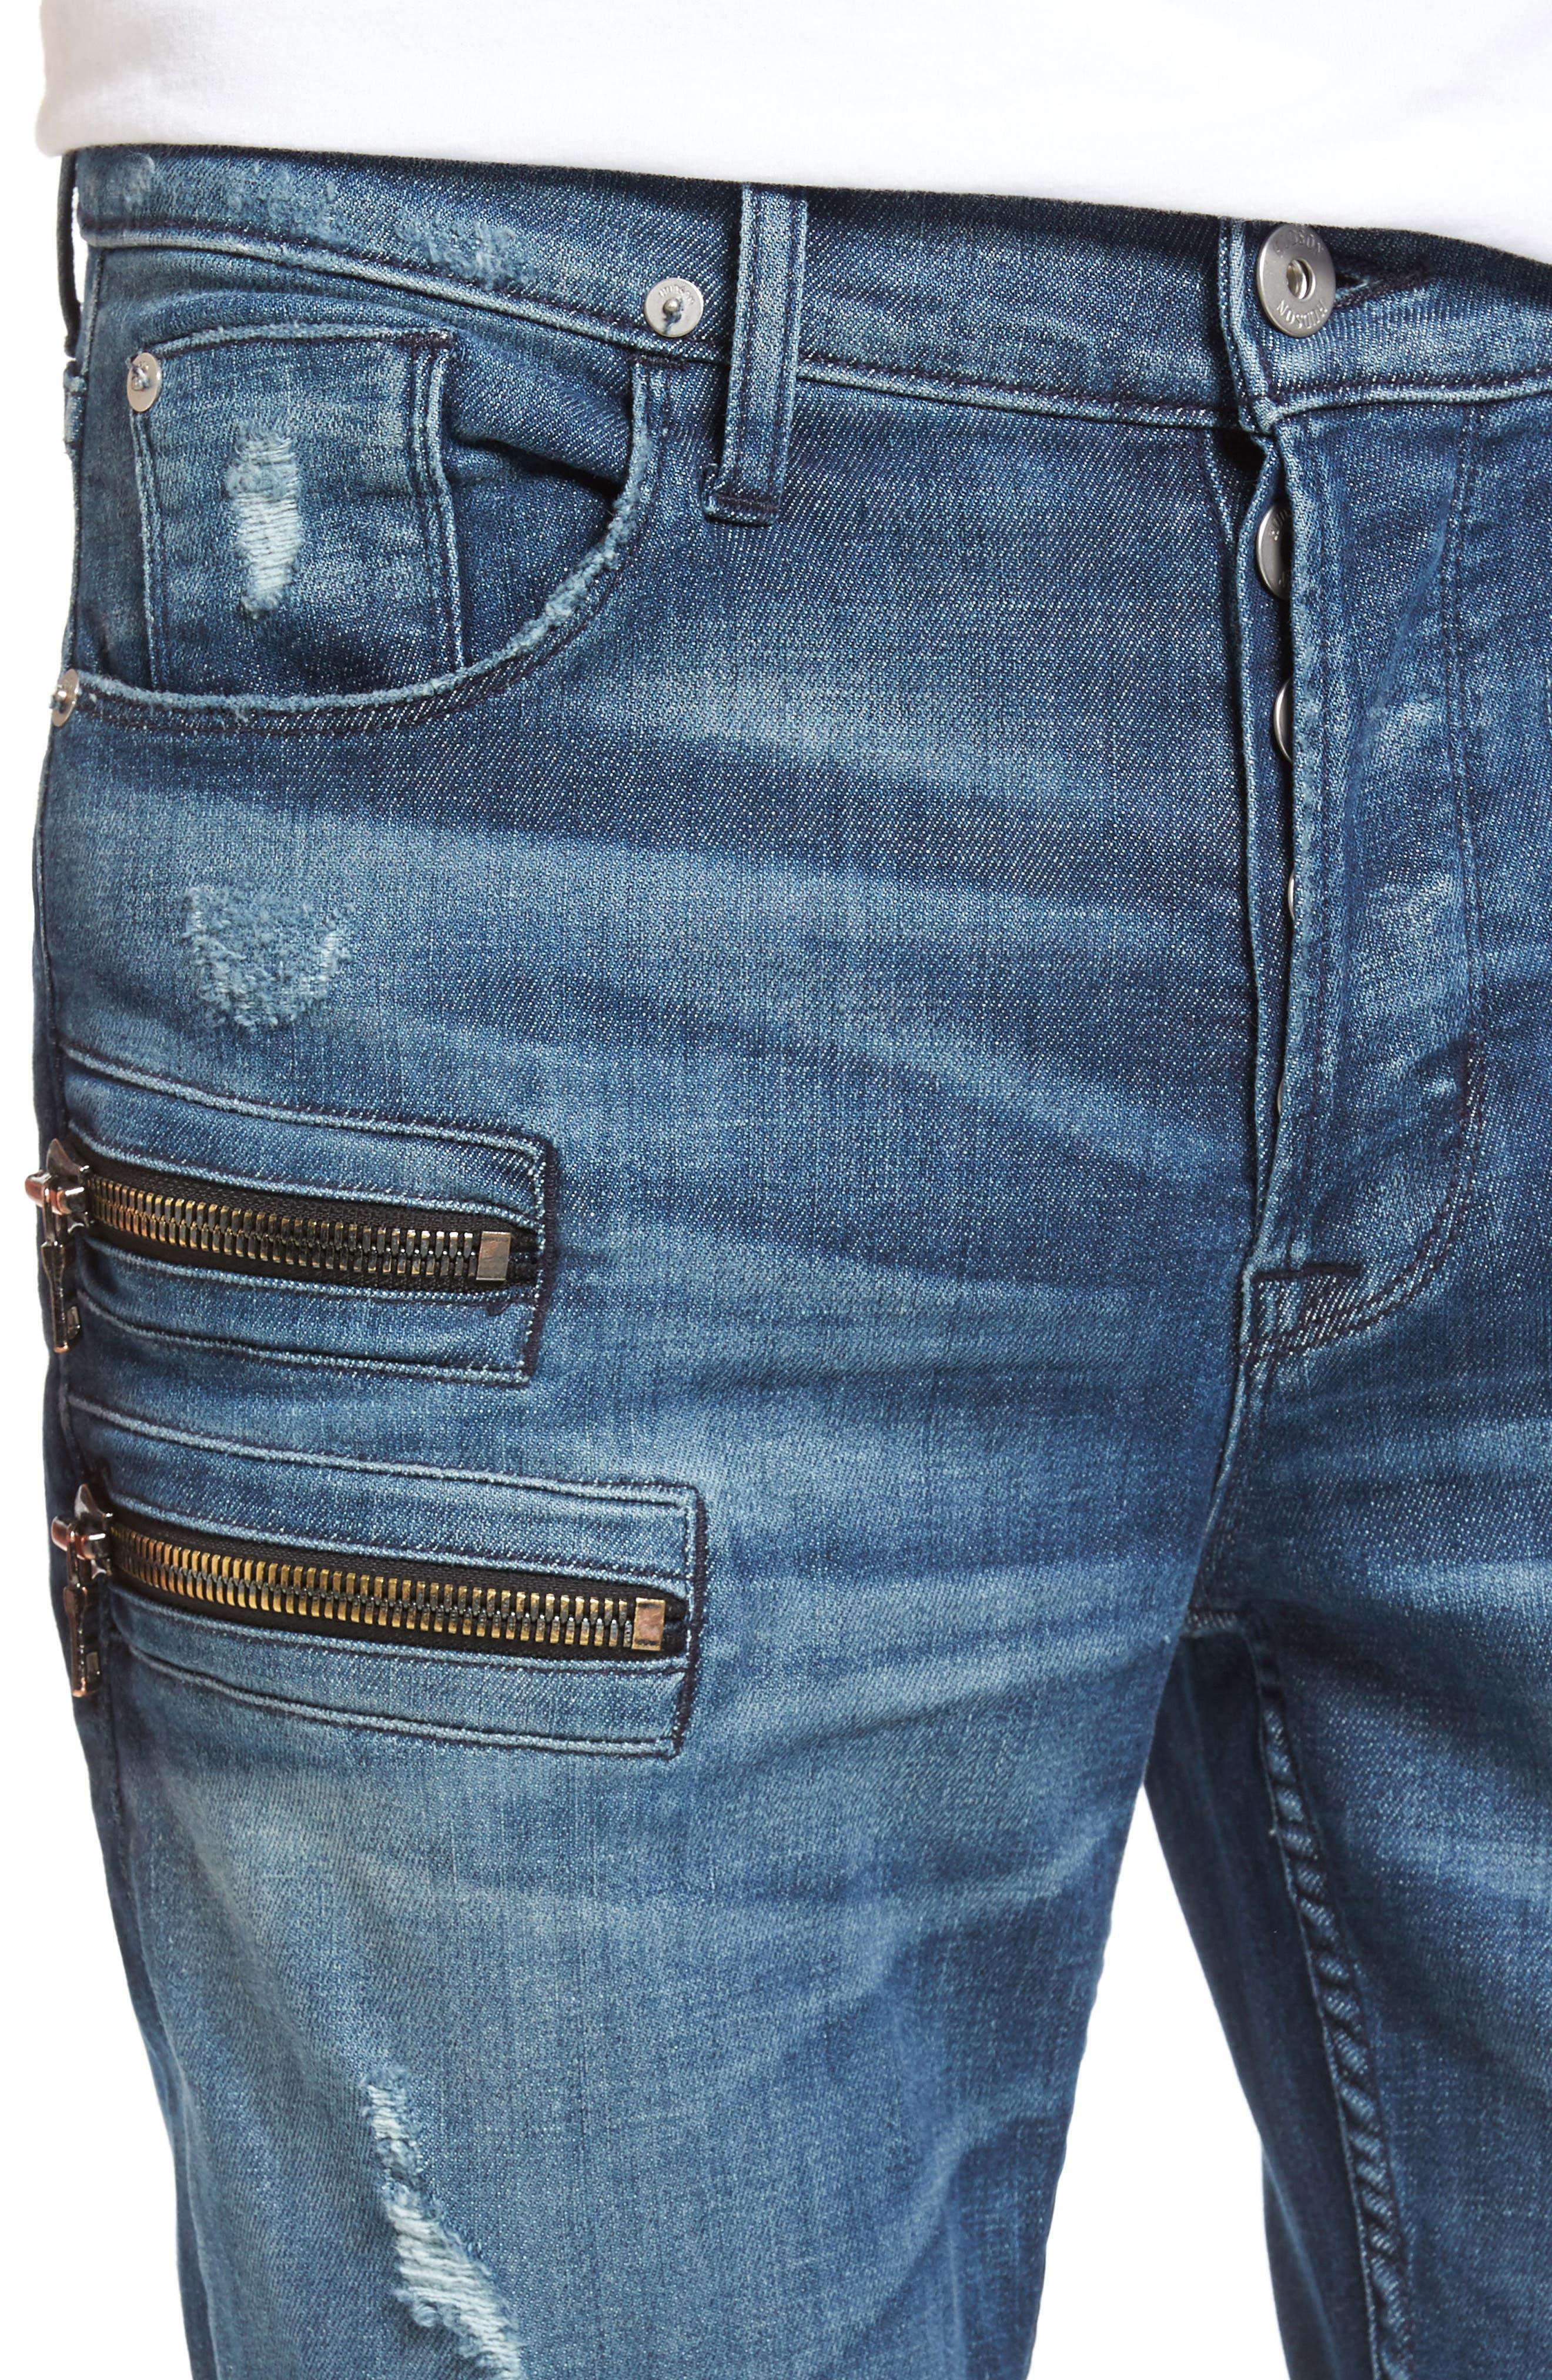 Broderick Biker Skinny Fit Jeans,                             Alternate thumbnail 4, color,                             455